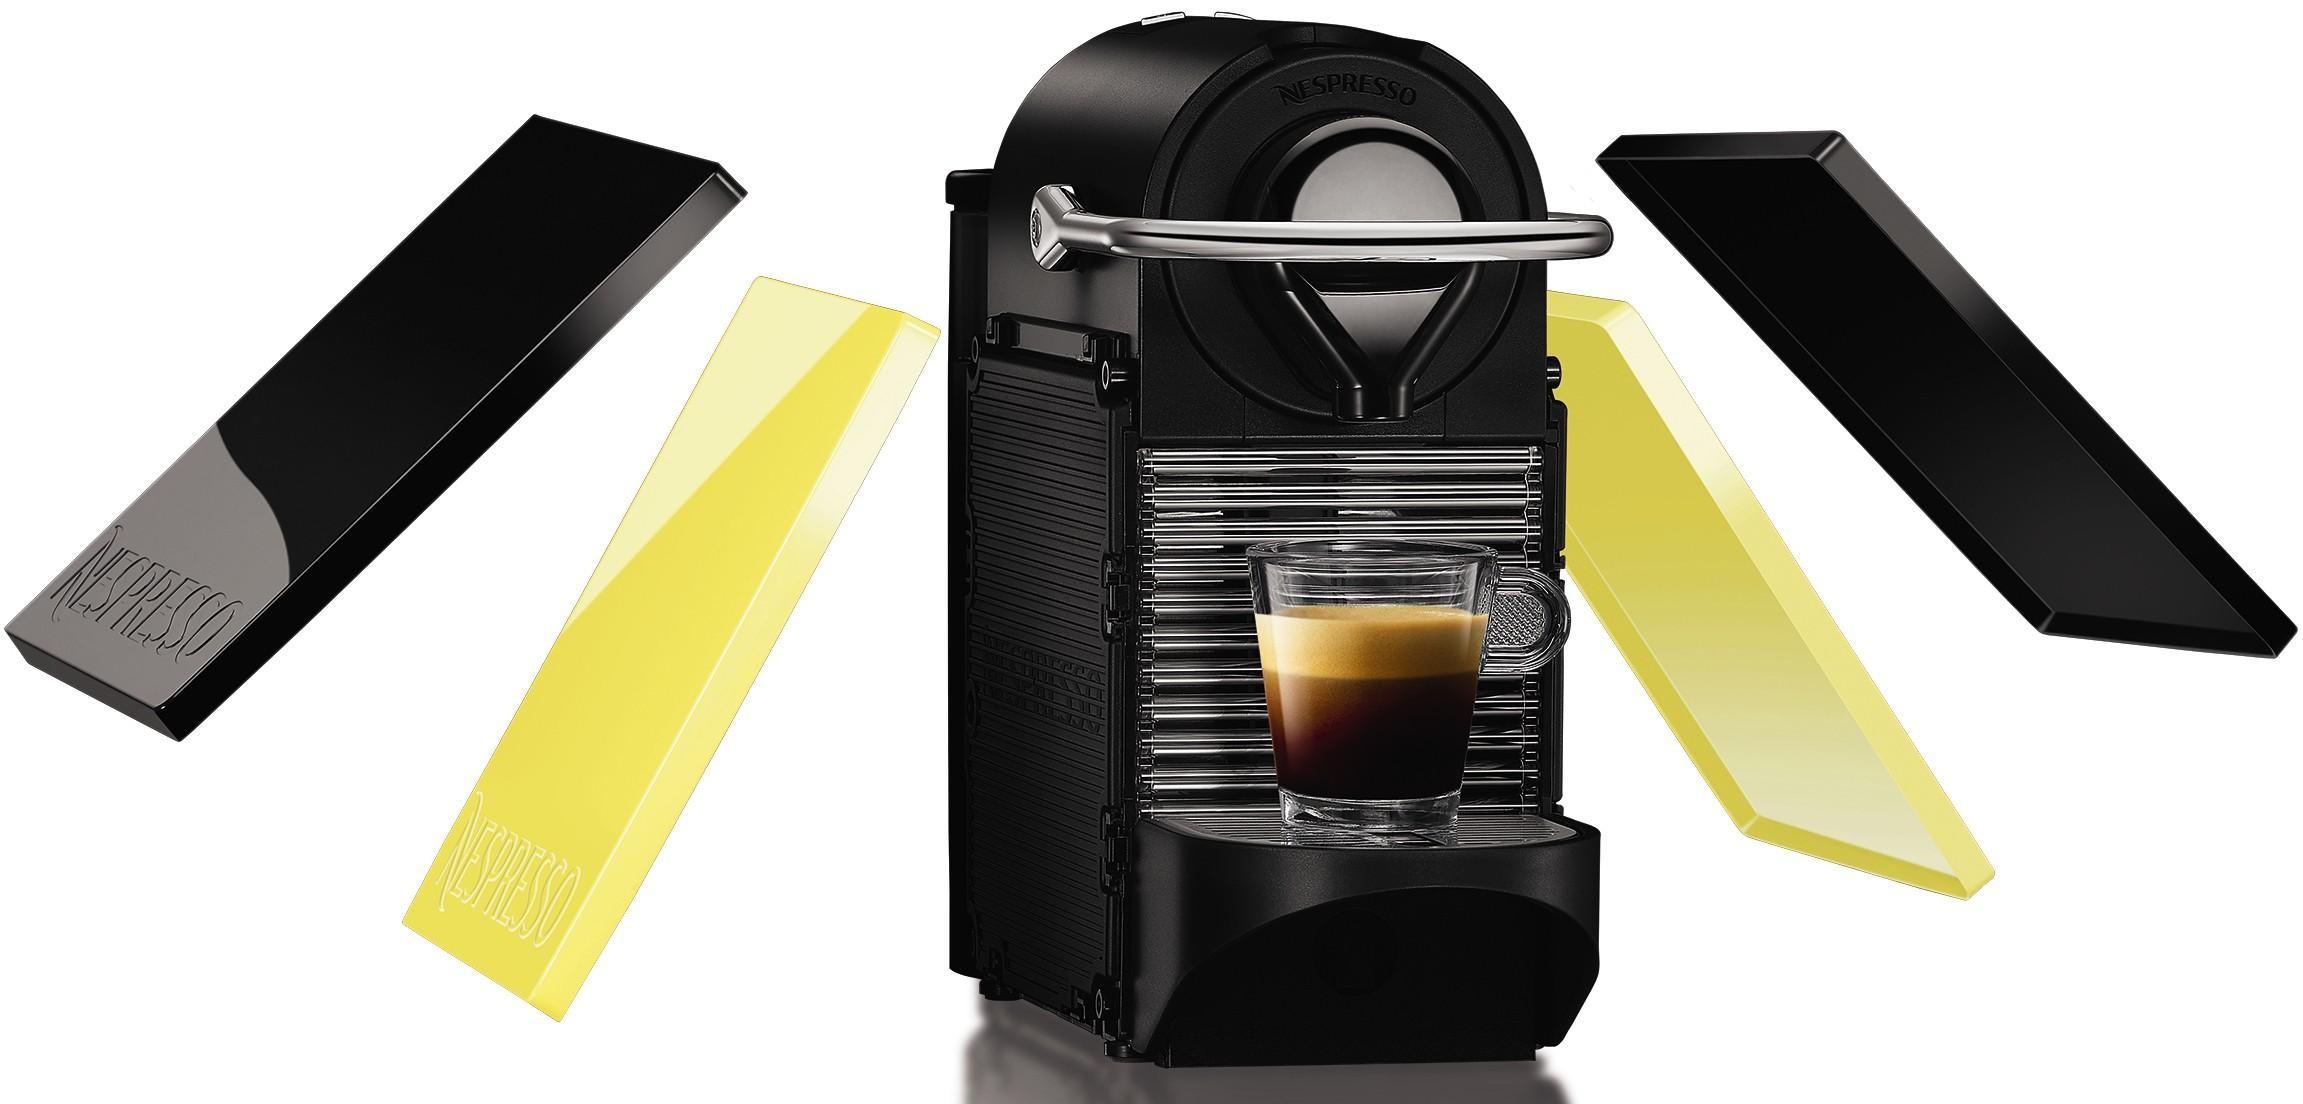 krups-nespresso-pixie-clips-coffee-maker-black-xn302040.jpg